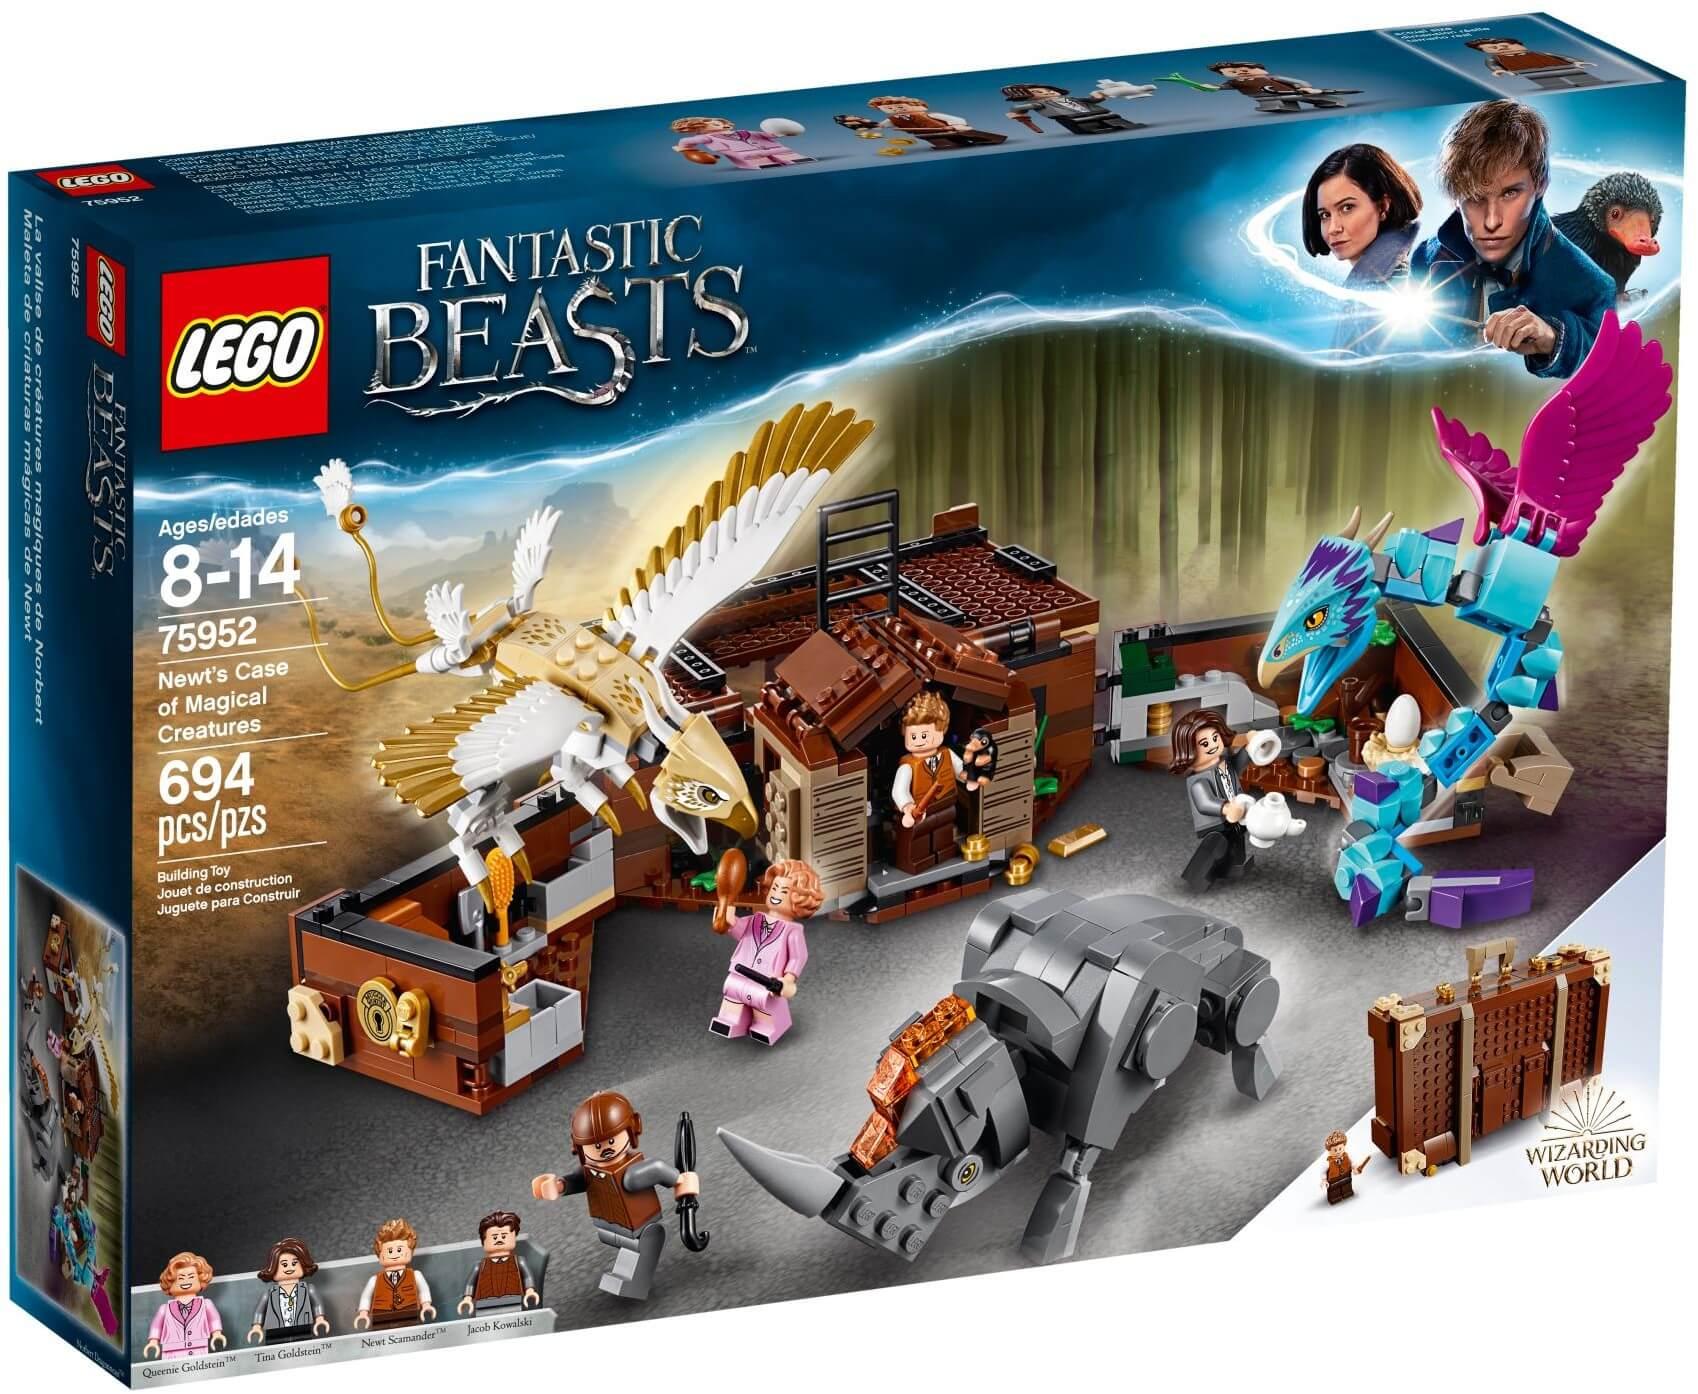 Mua đồ chơi LEGO 75952 - LEGO Harry Potter 75952 - Những Sinh Vật Huyền Thoại của Newt (LEGO 75952 Newt´s Case of Magical Creatures)